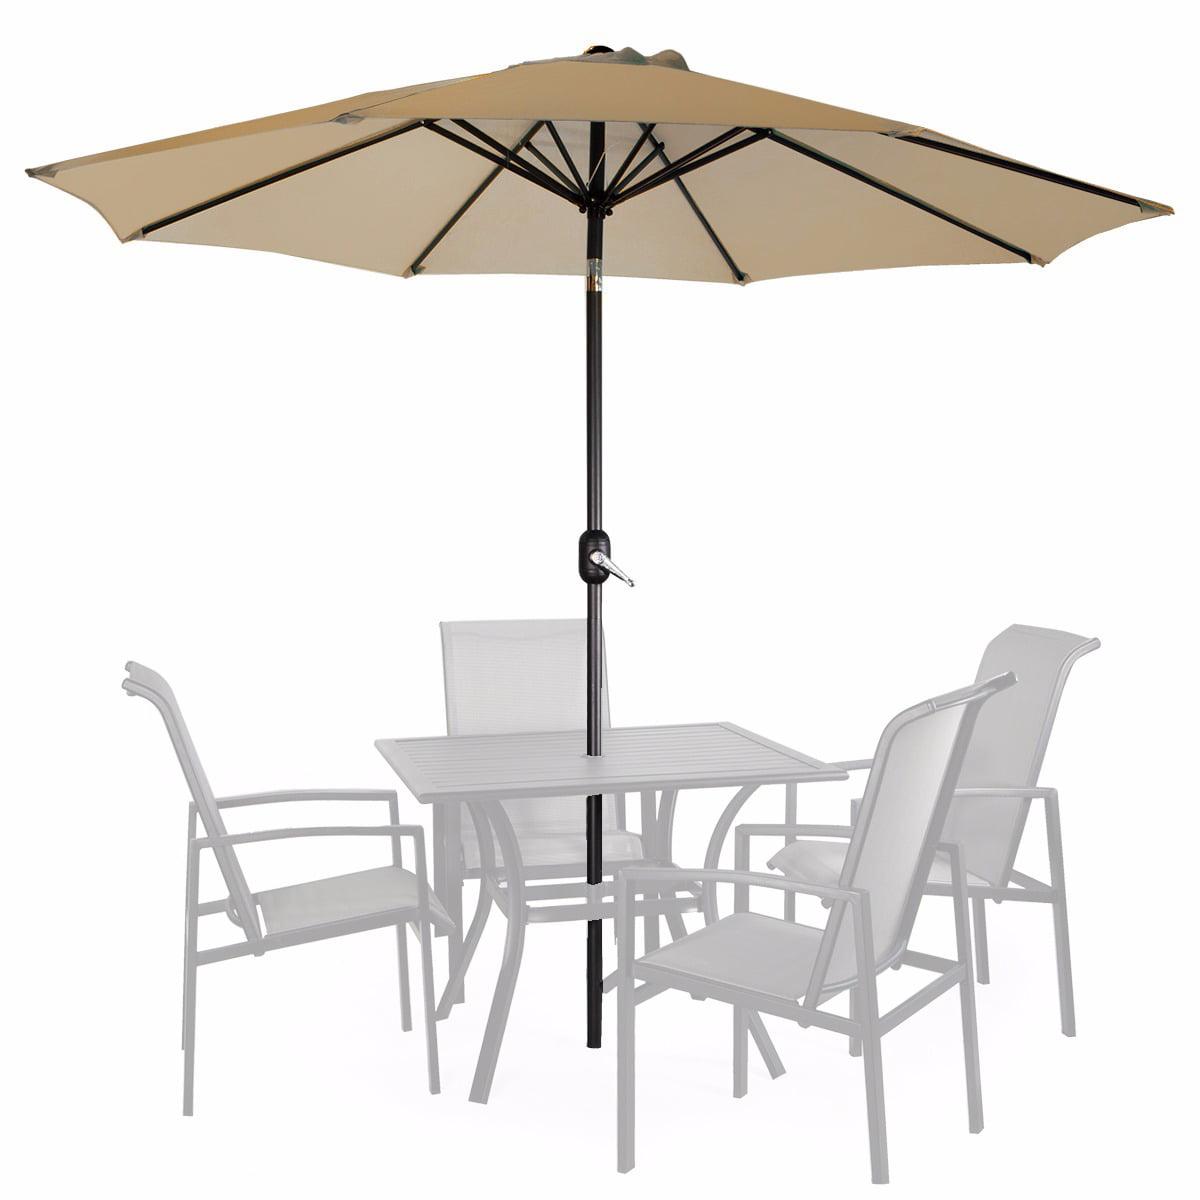 9 Patio Umbrella Round Sunshade Outdoor Canopy Tilt And Crank Tan